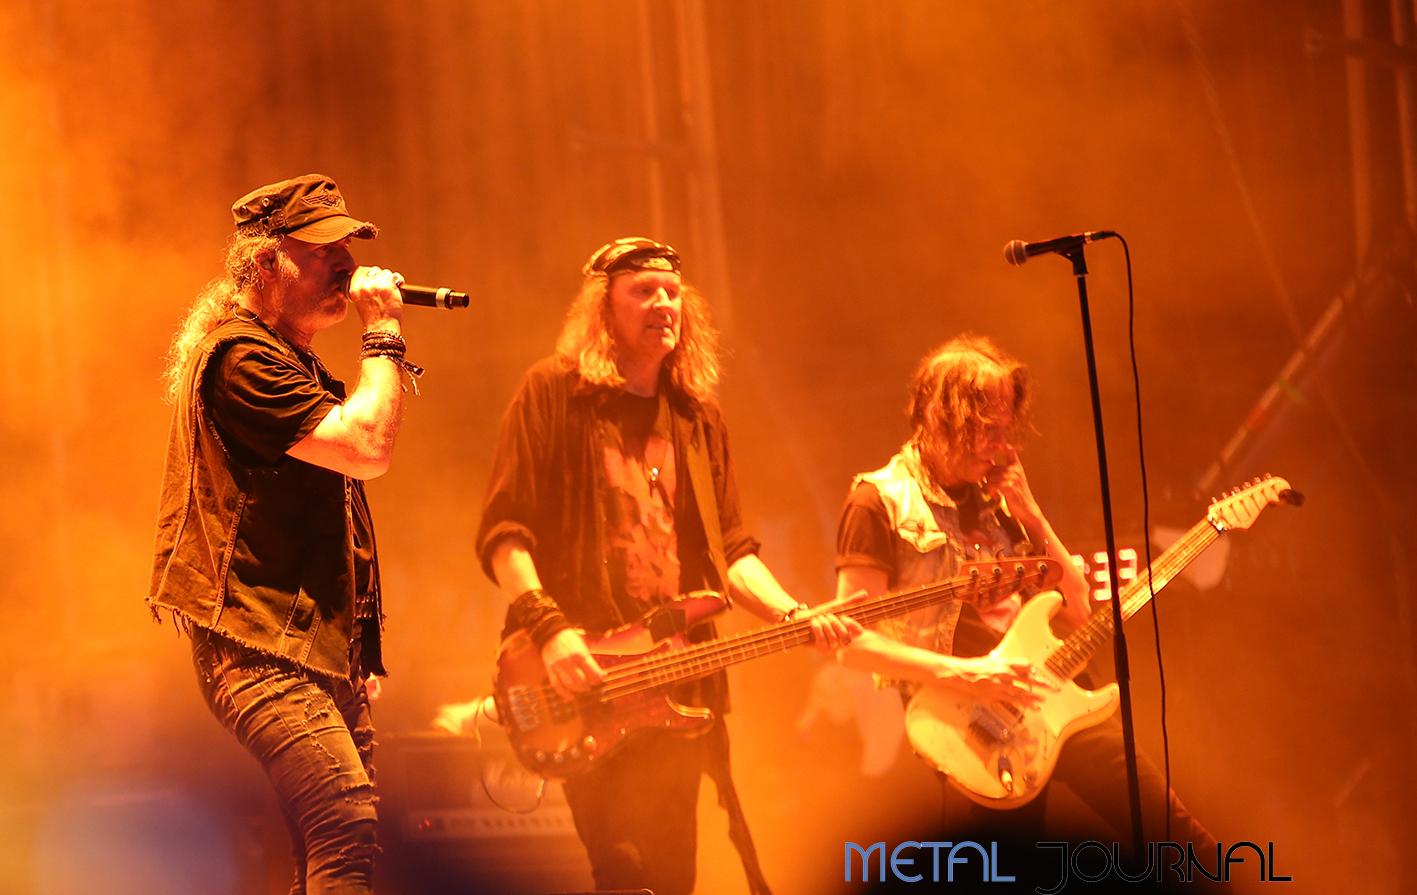 krokus - metal journal rock fest barcelona 2019 pic 4